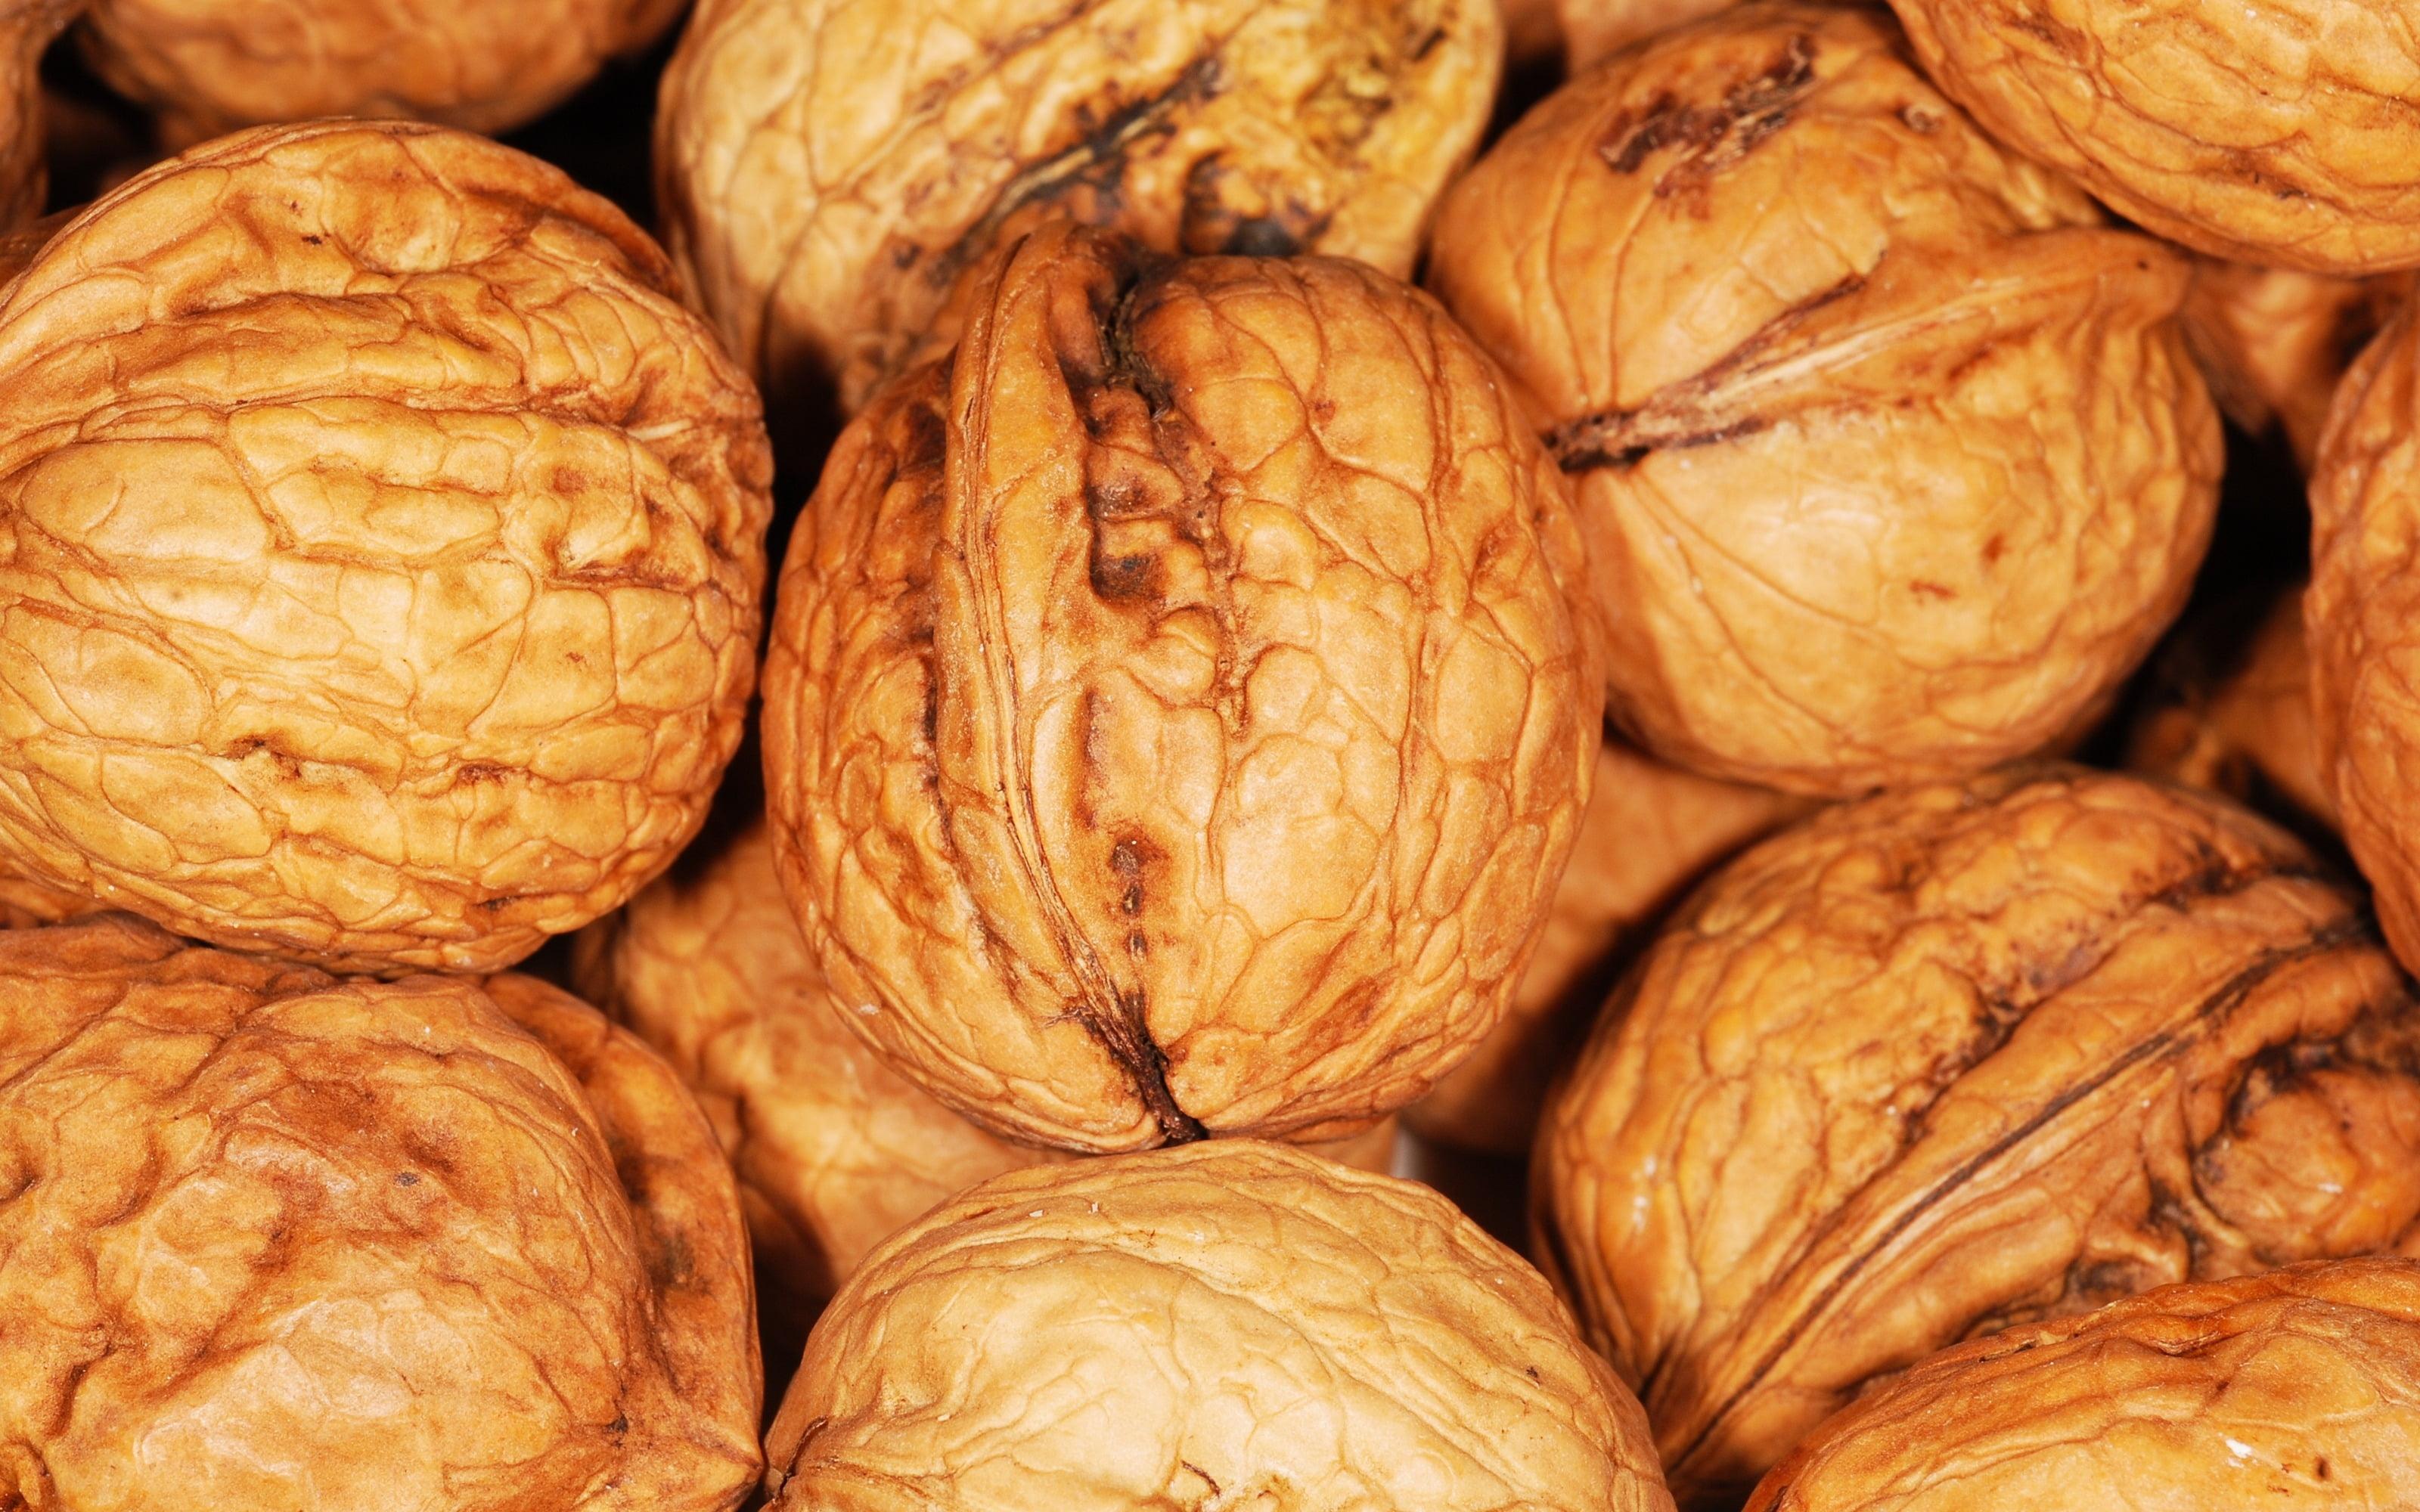 Brown nut lot HD wallpaper | Wallpaper Flare